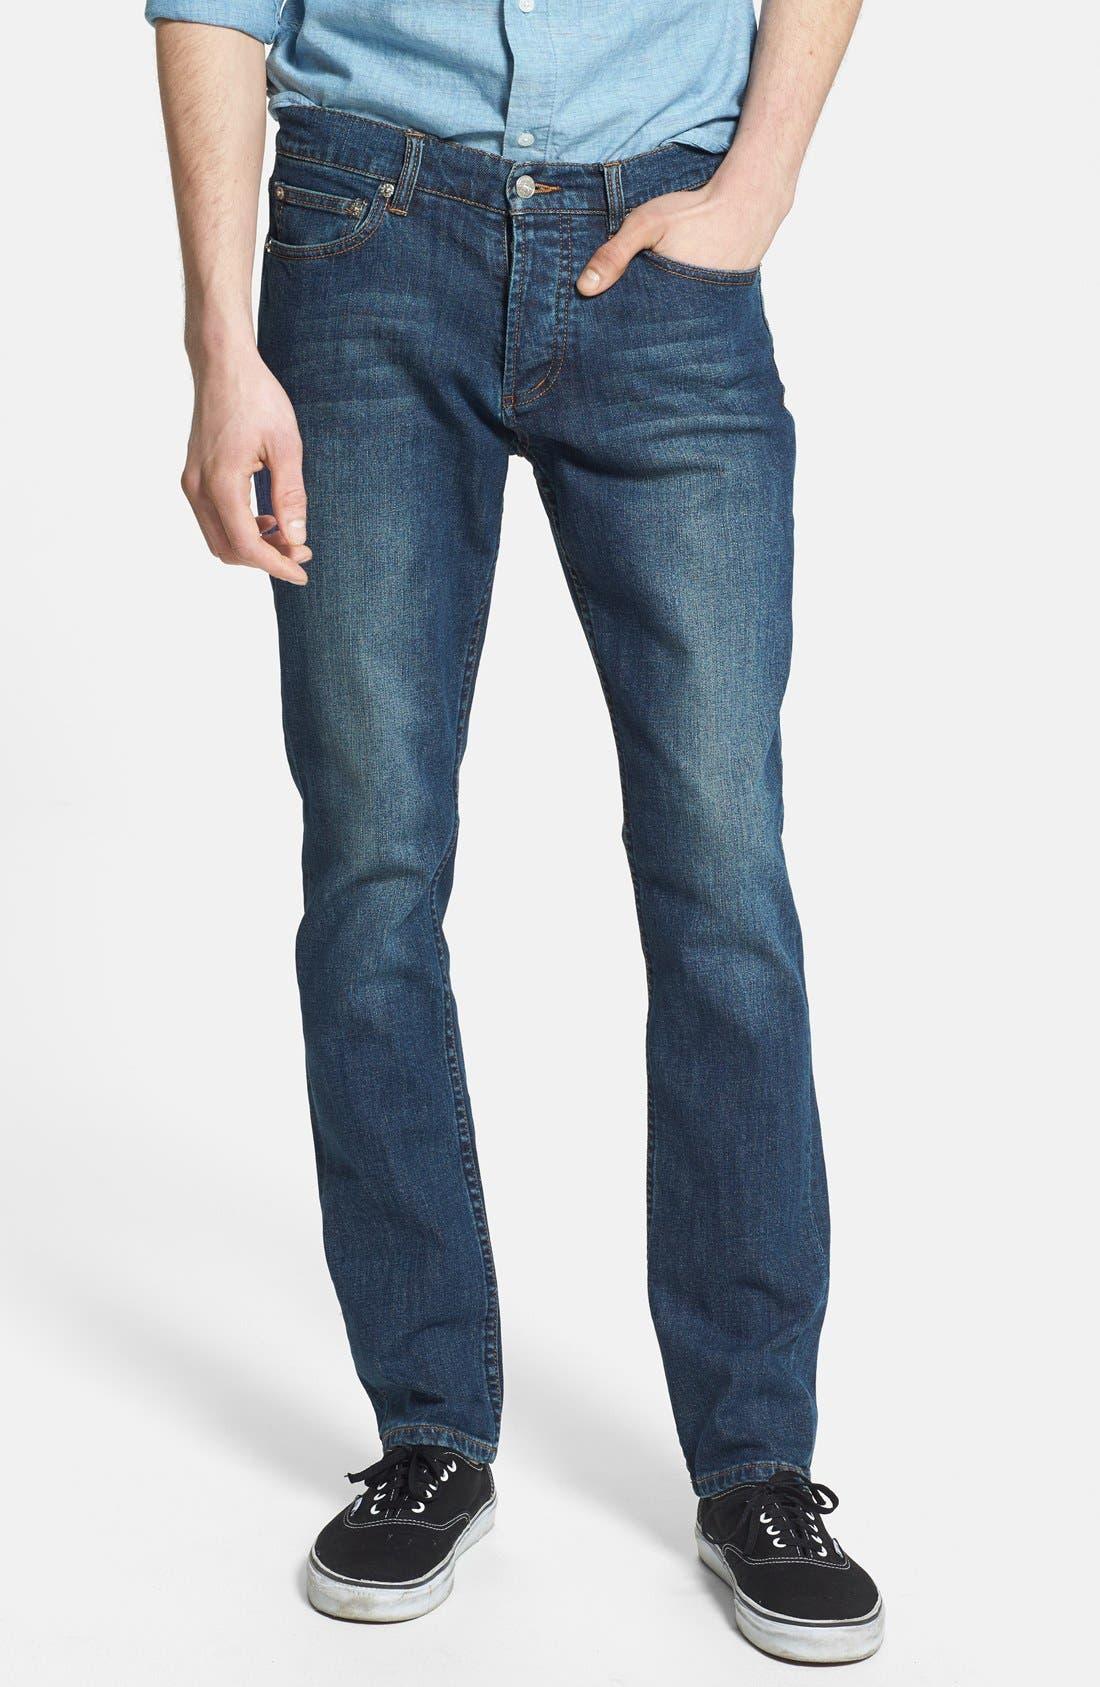 Obey Mens Threat Cut Denim Jeans